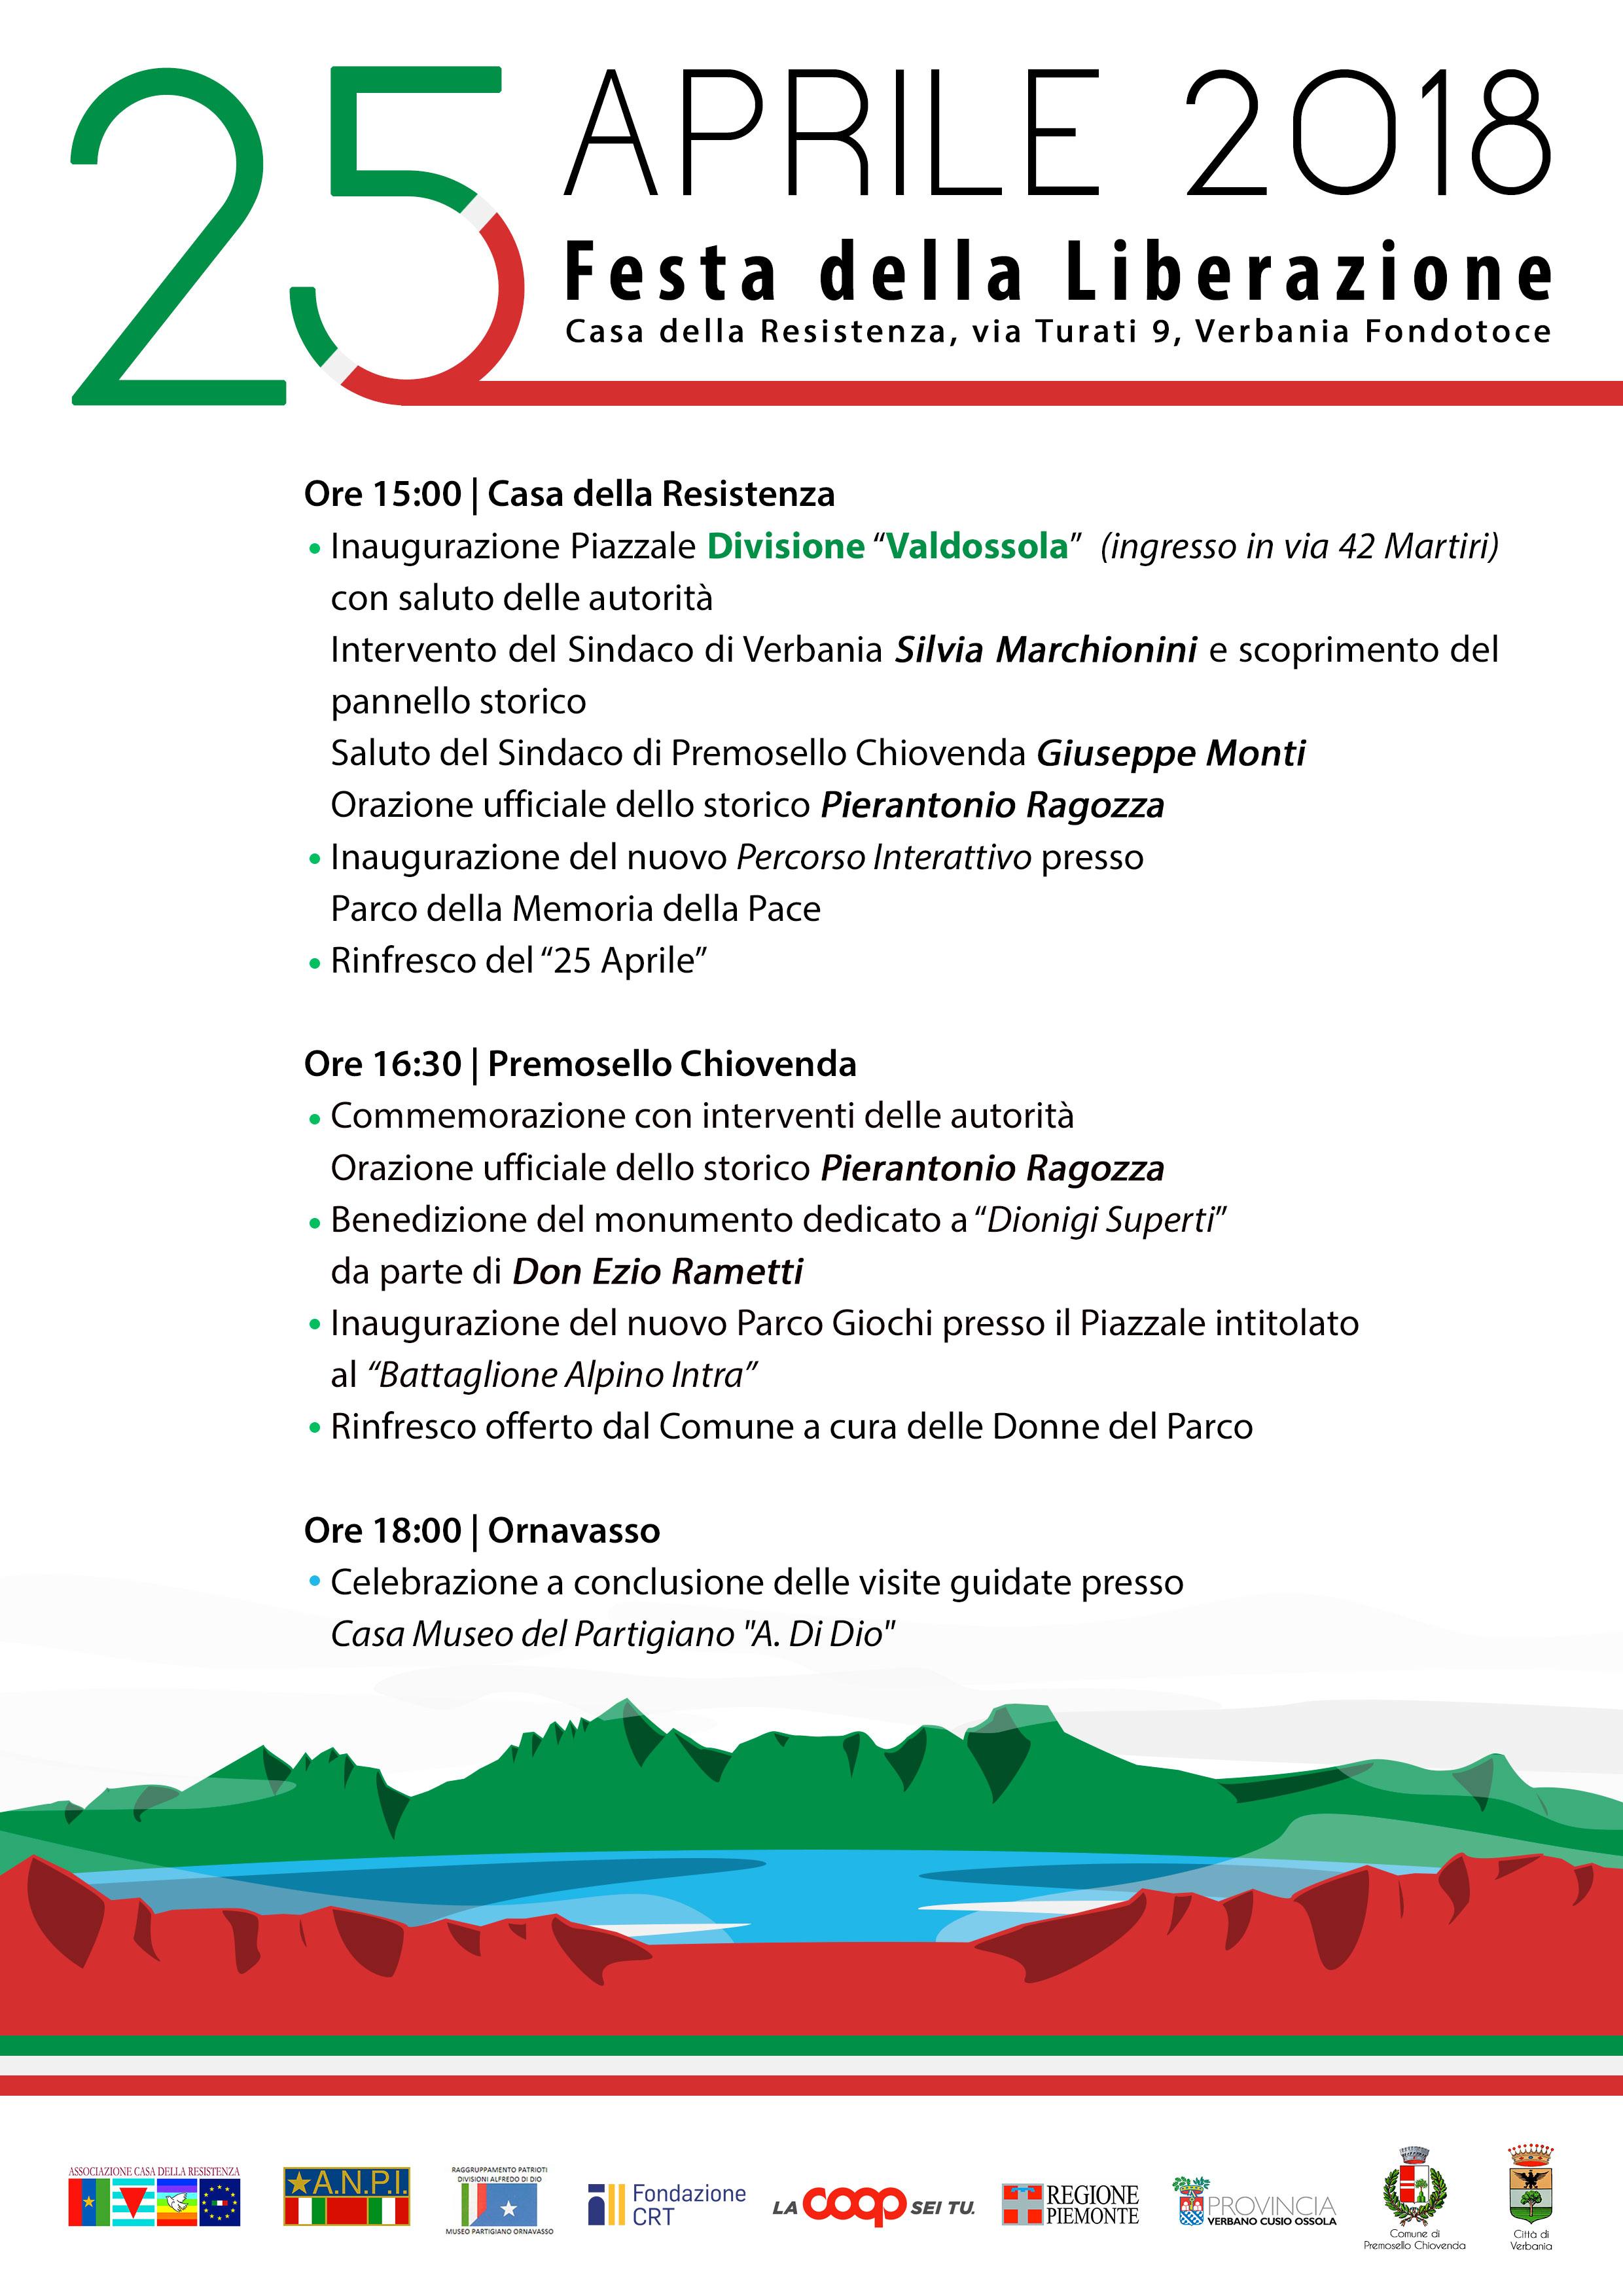 Banca del piemonte online dating 1